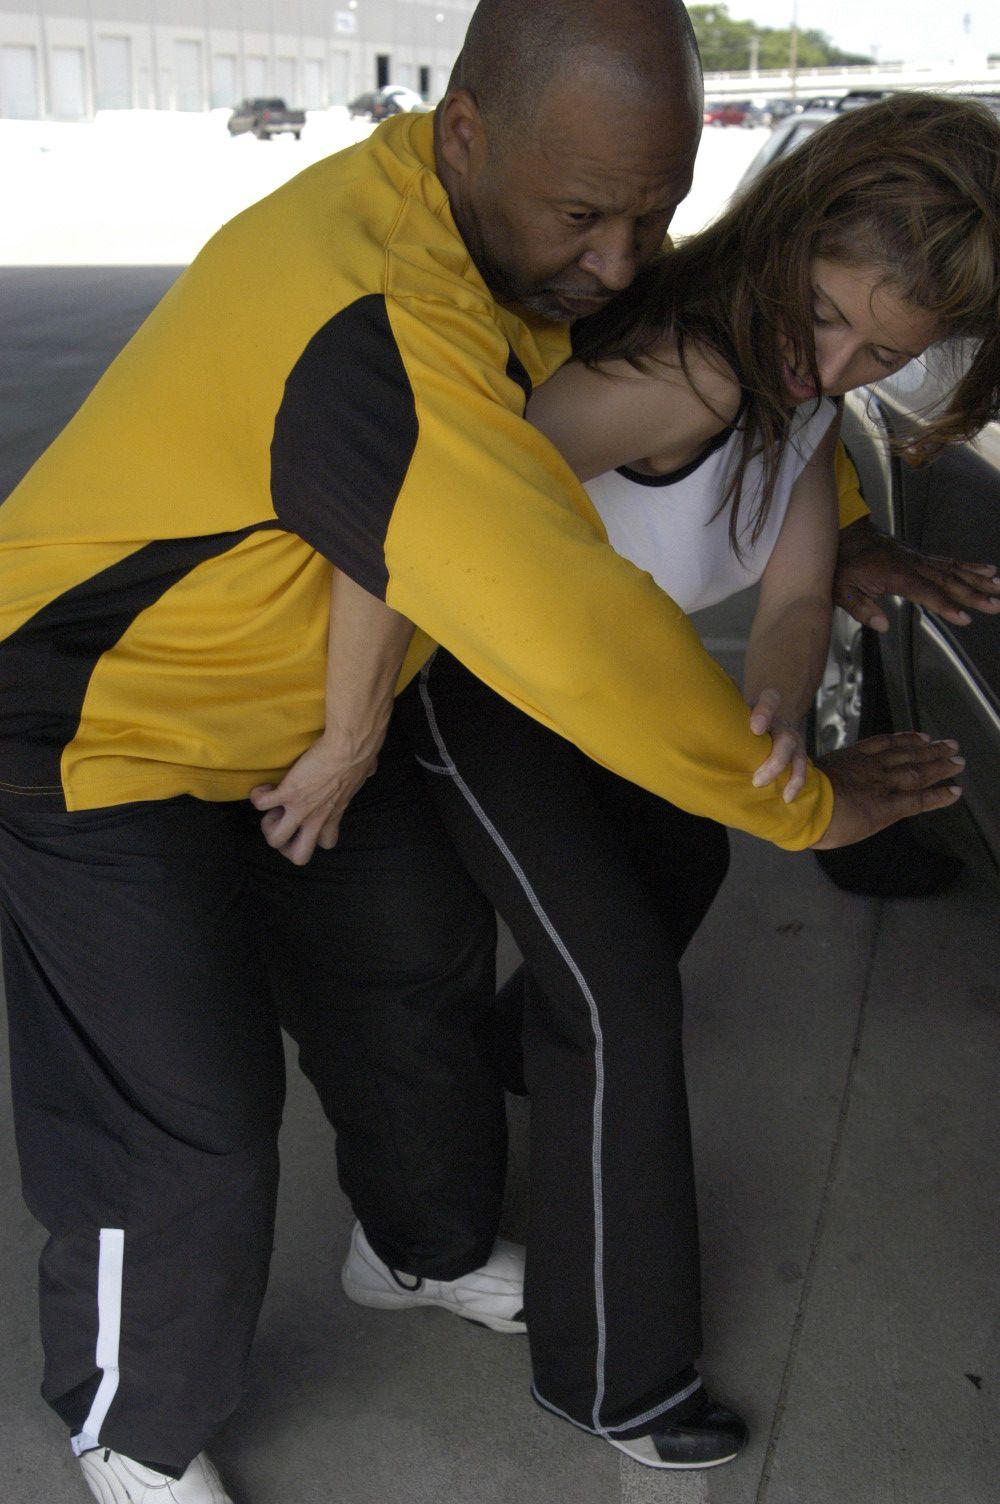 pin by glc enterprises  hidden cameras  self defense on self defense for women